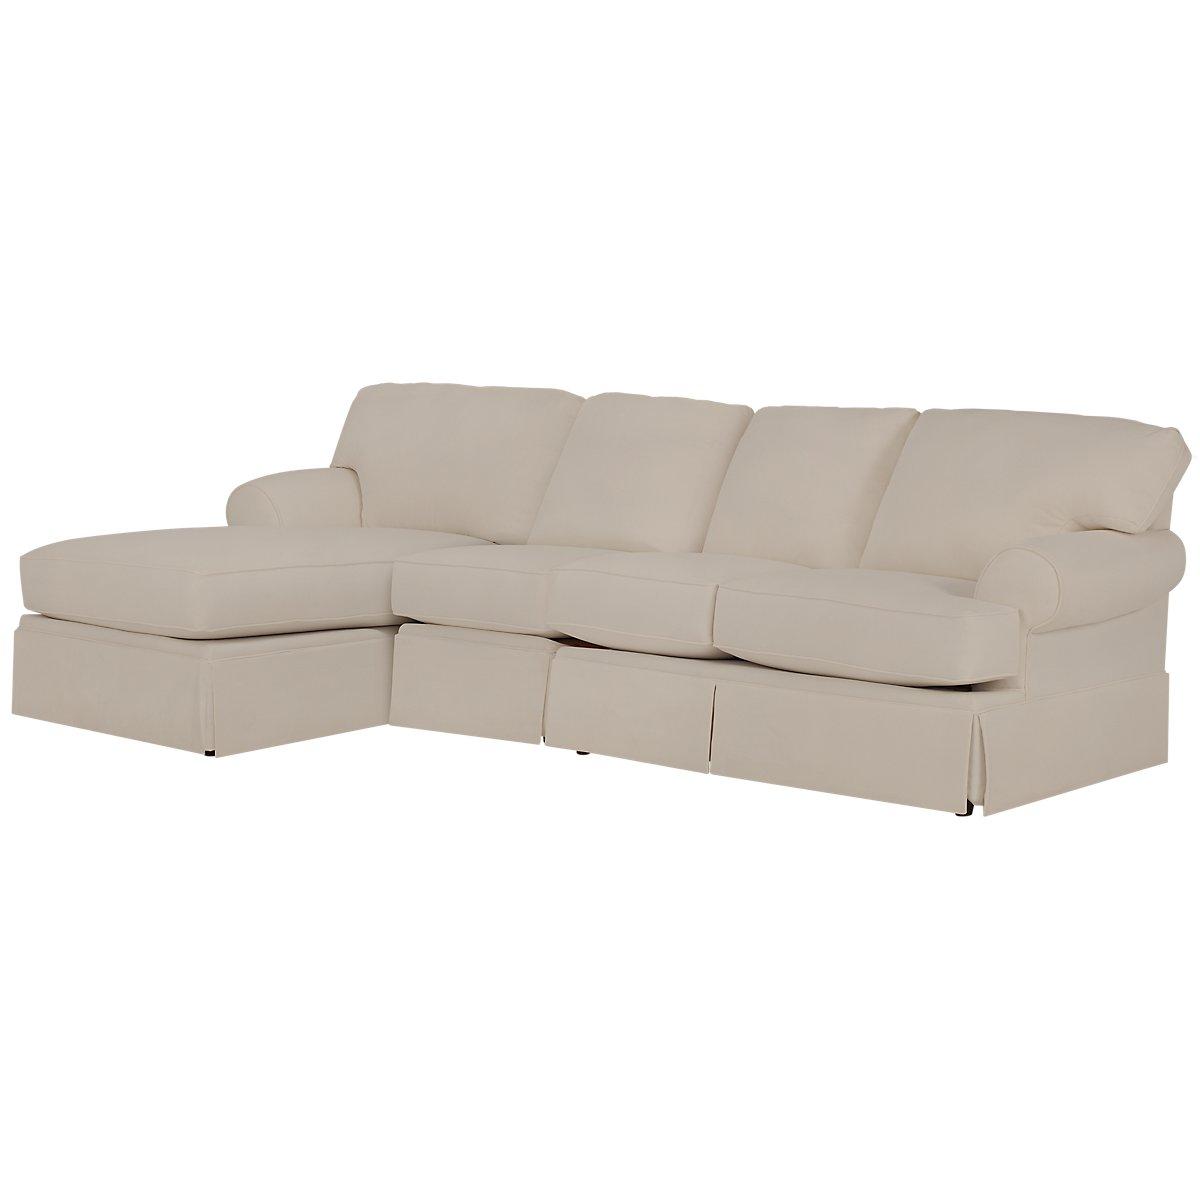 City furniture turner khaki fabric small left chaise for Chaise kaki